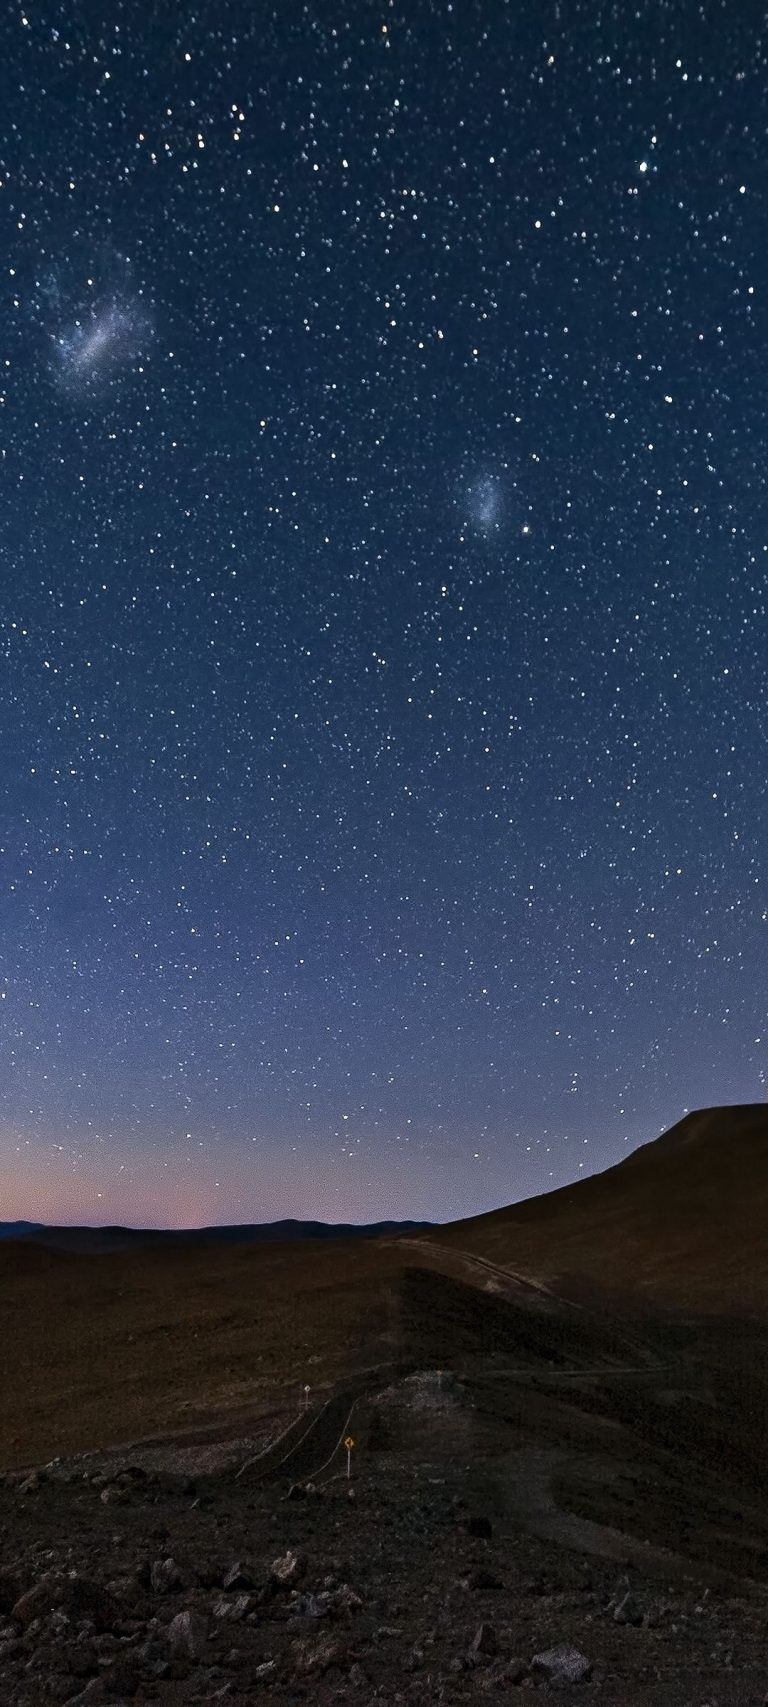 Sky Constellations Night Desert Mountain 1080x2400 768x1707